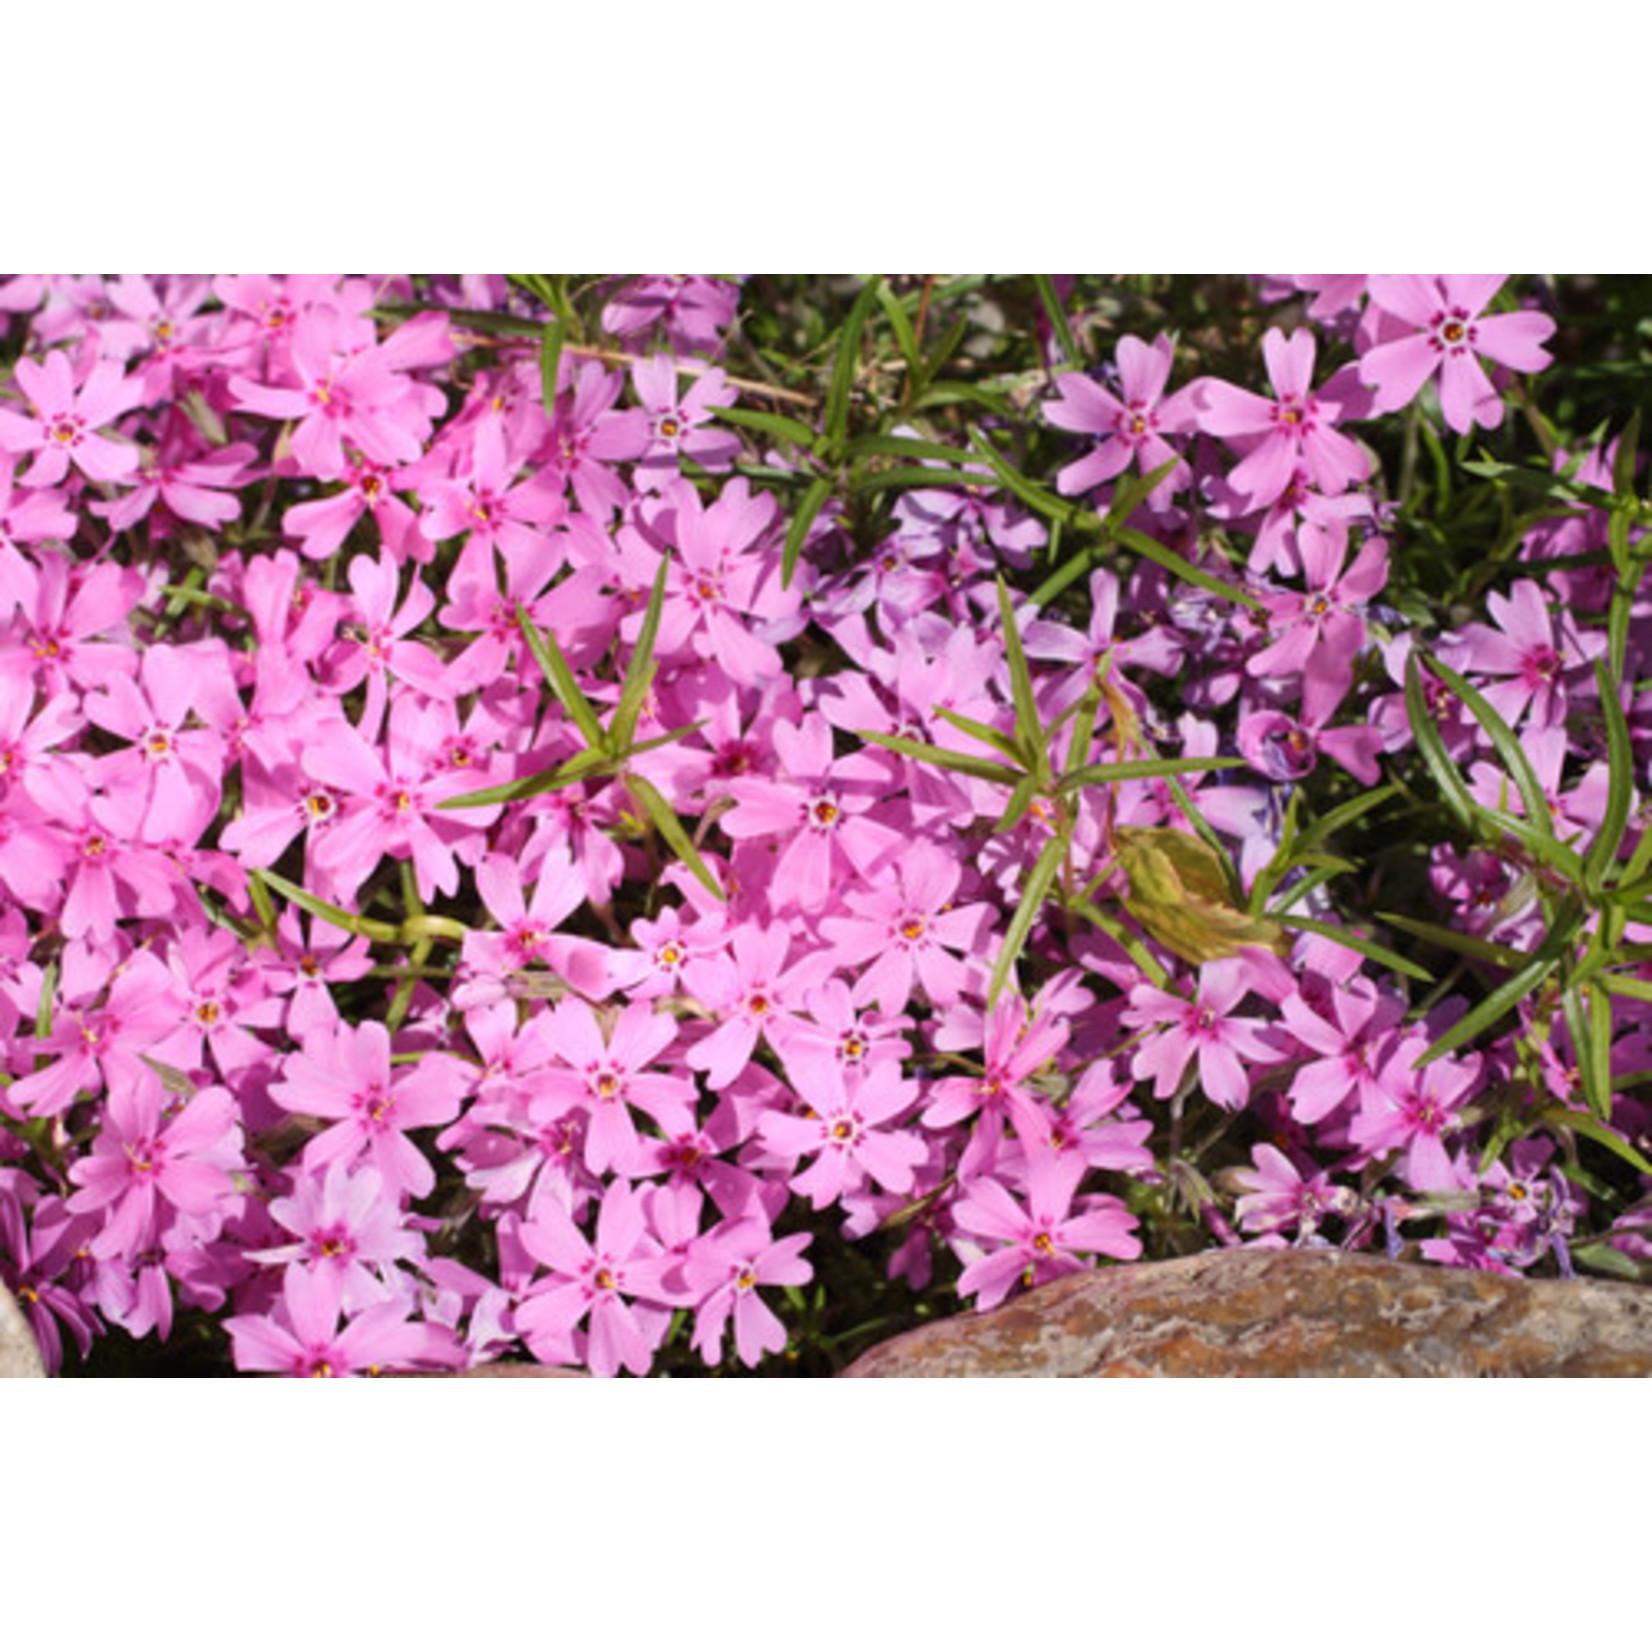 Phlox 'Emerald Pink' 1g